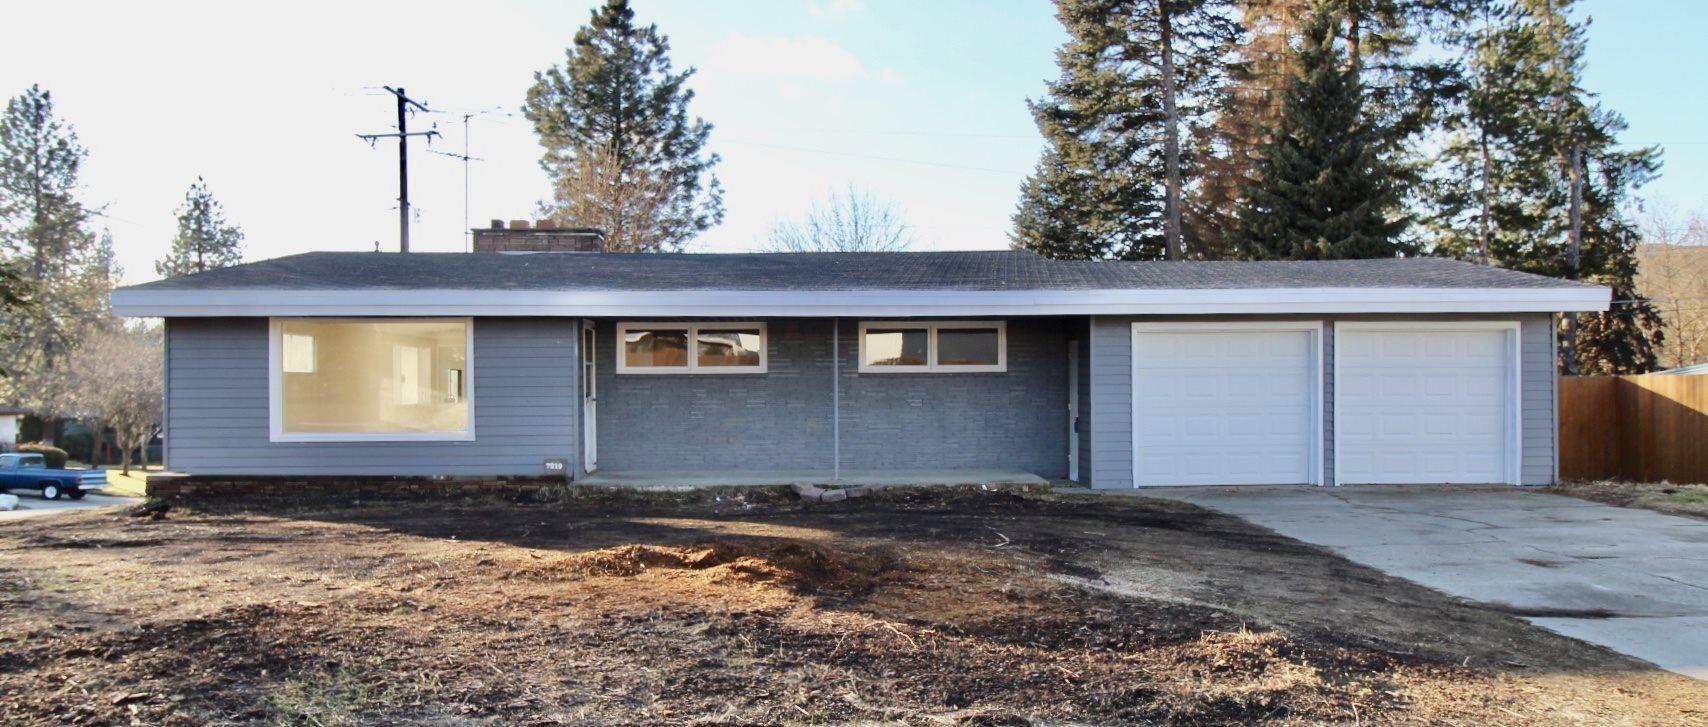 7519 N Wall St, Spokane, WA 99208 - #: 202110685